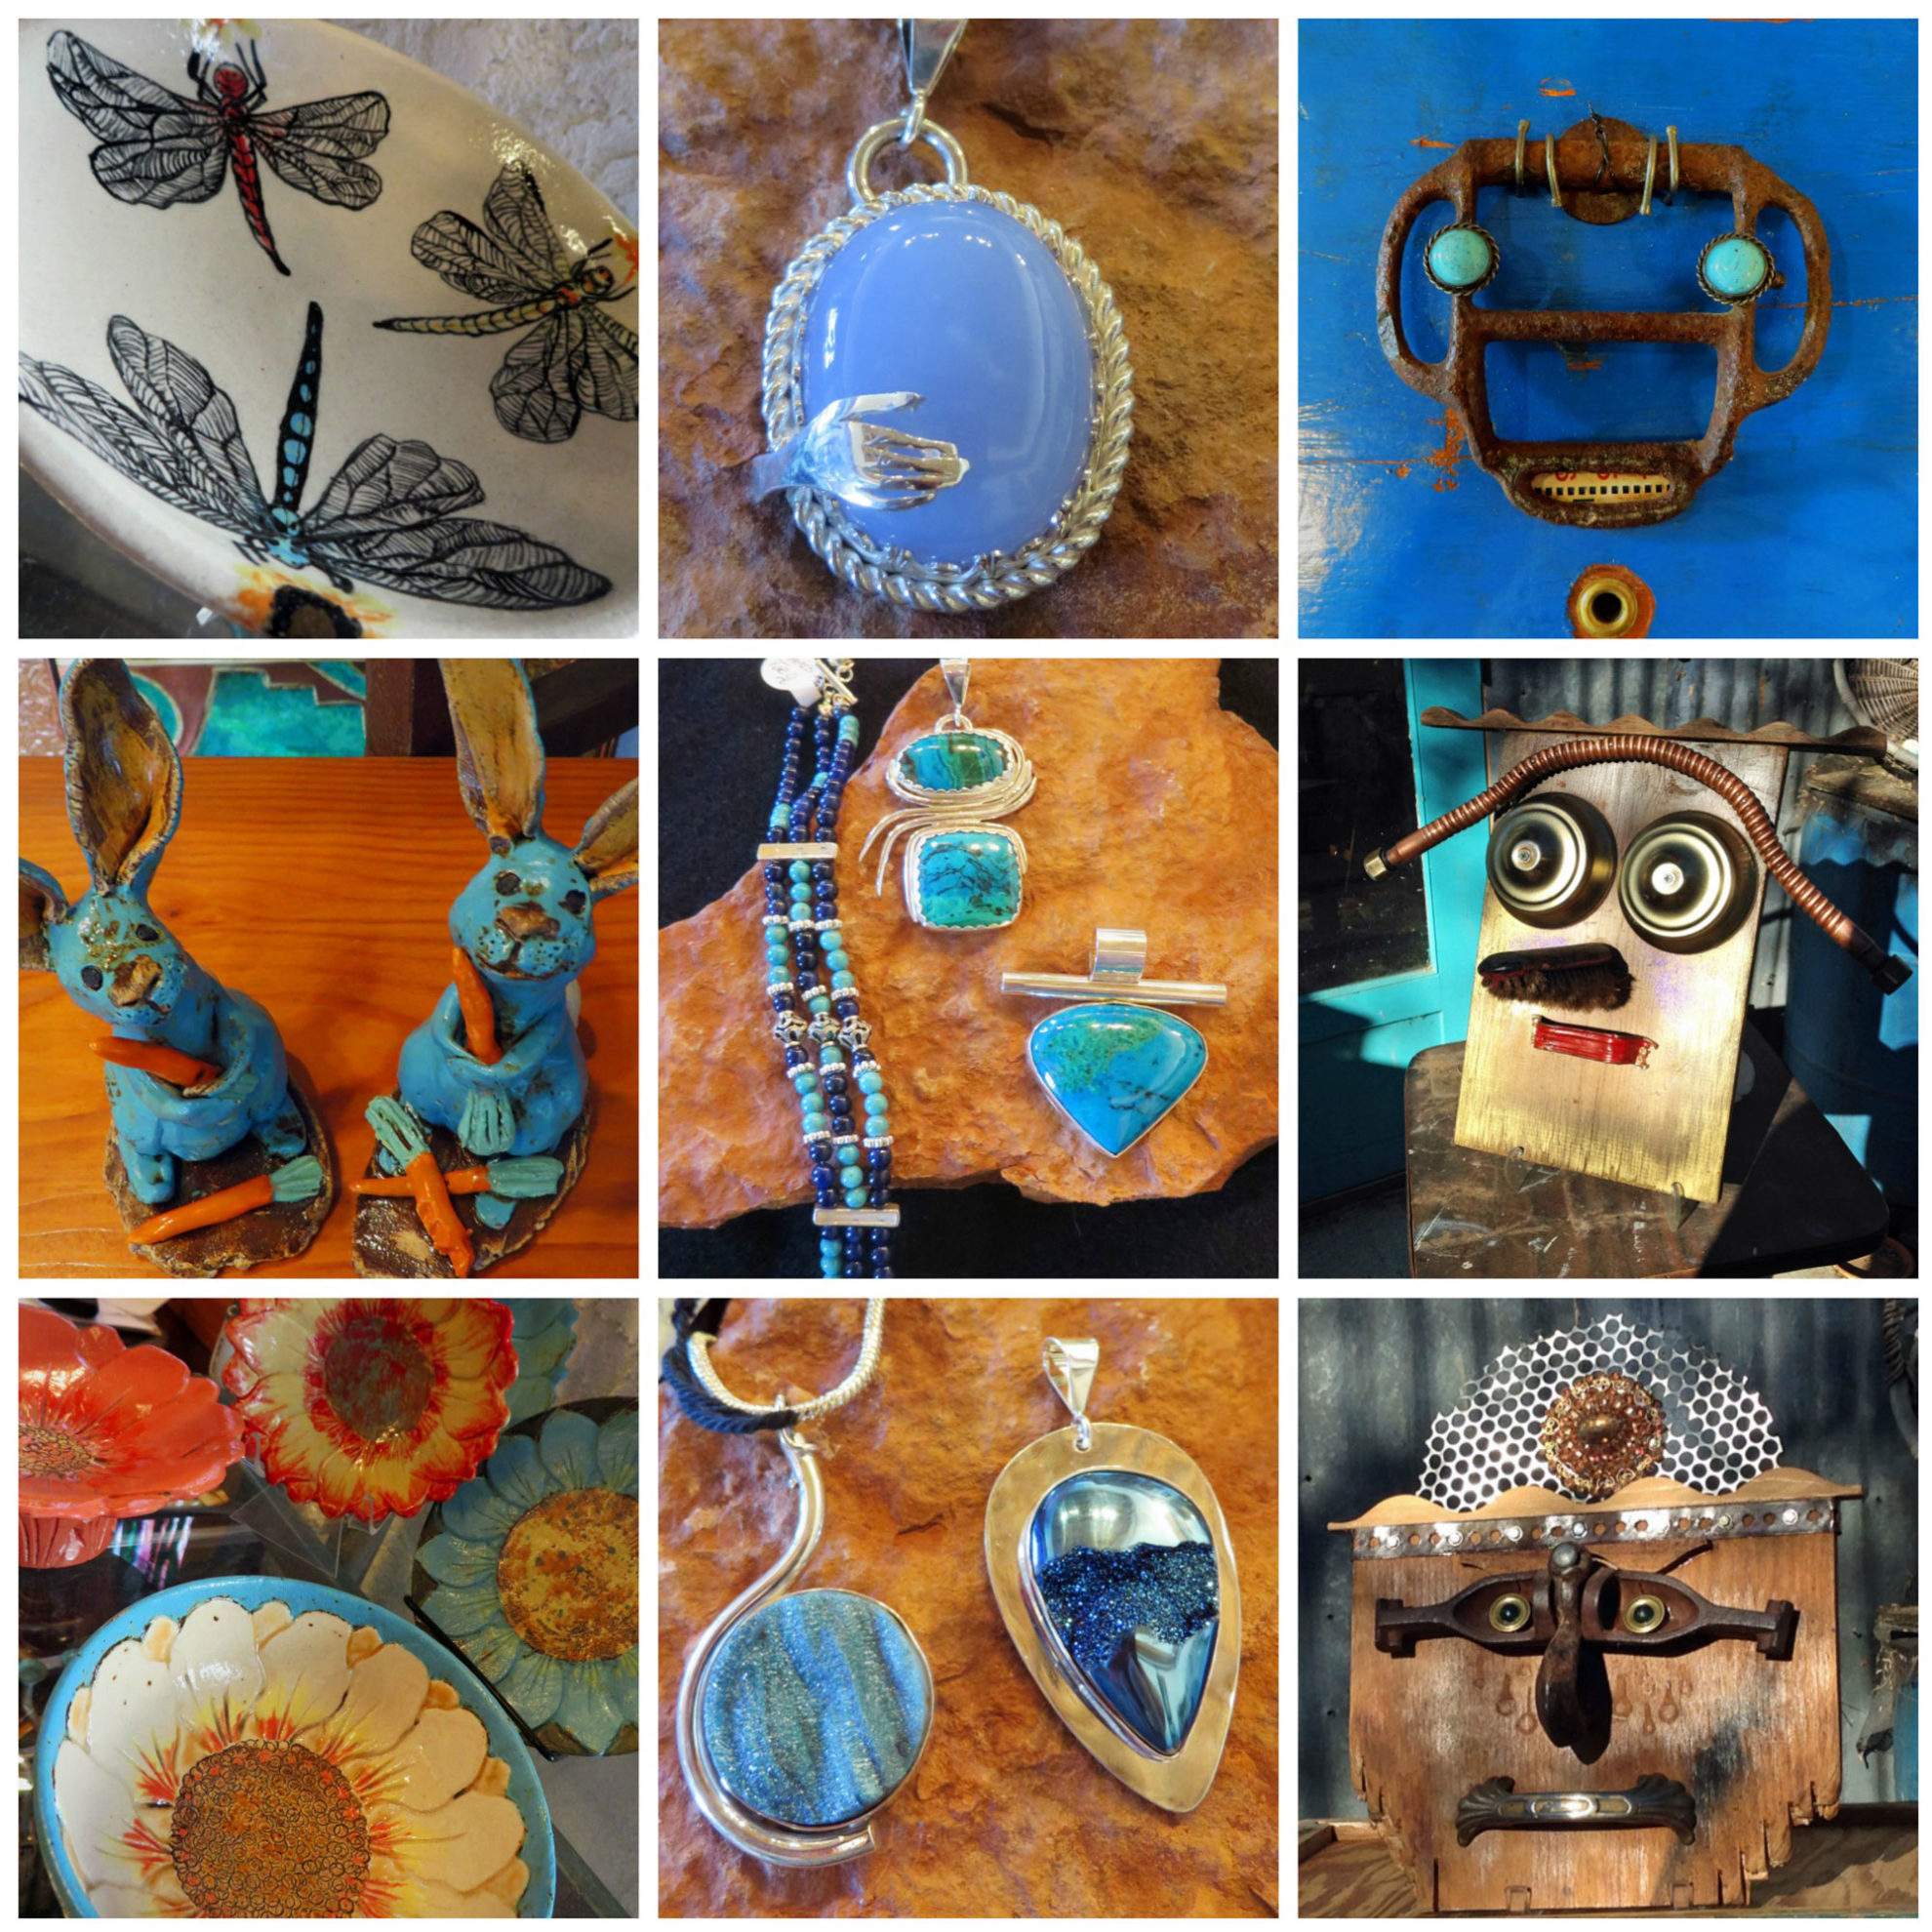 Gift Ideas in Tucson